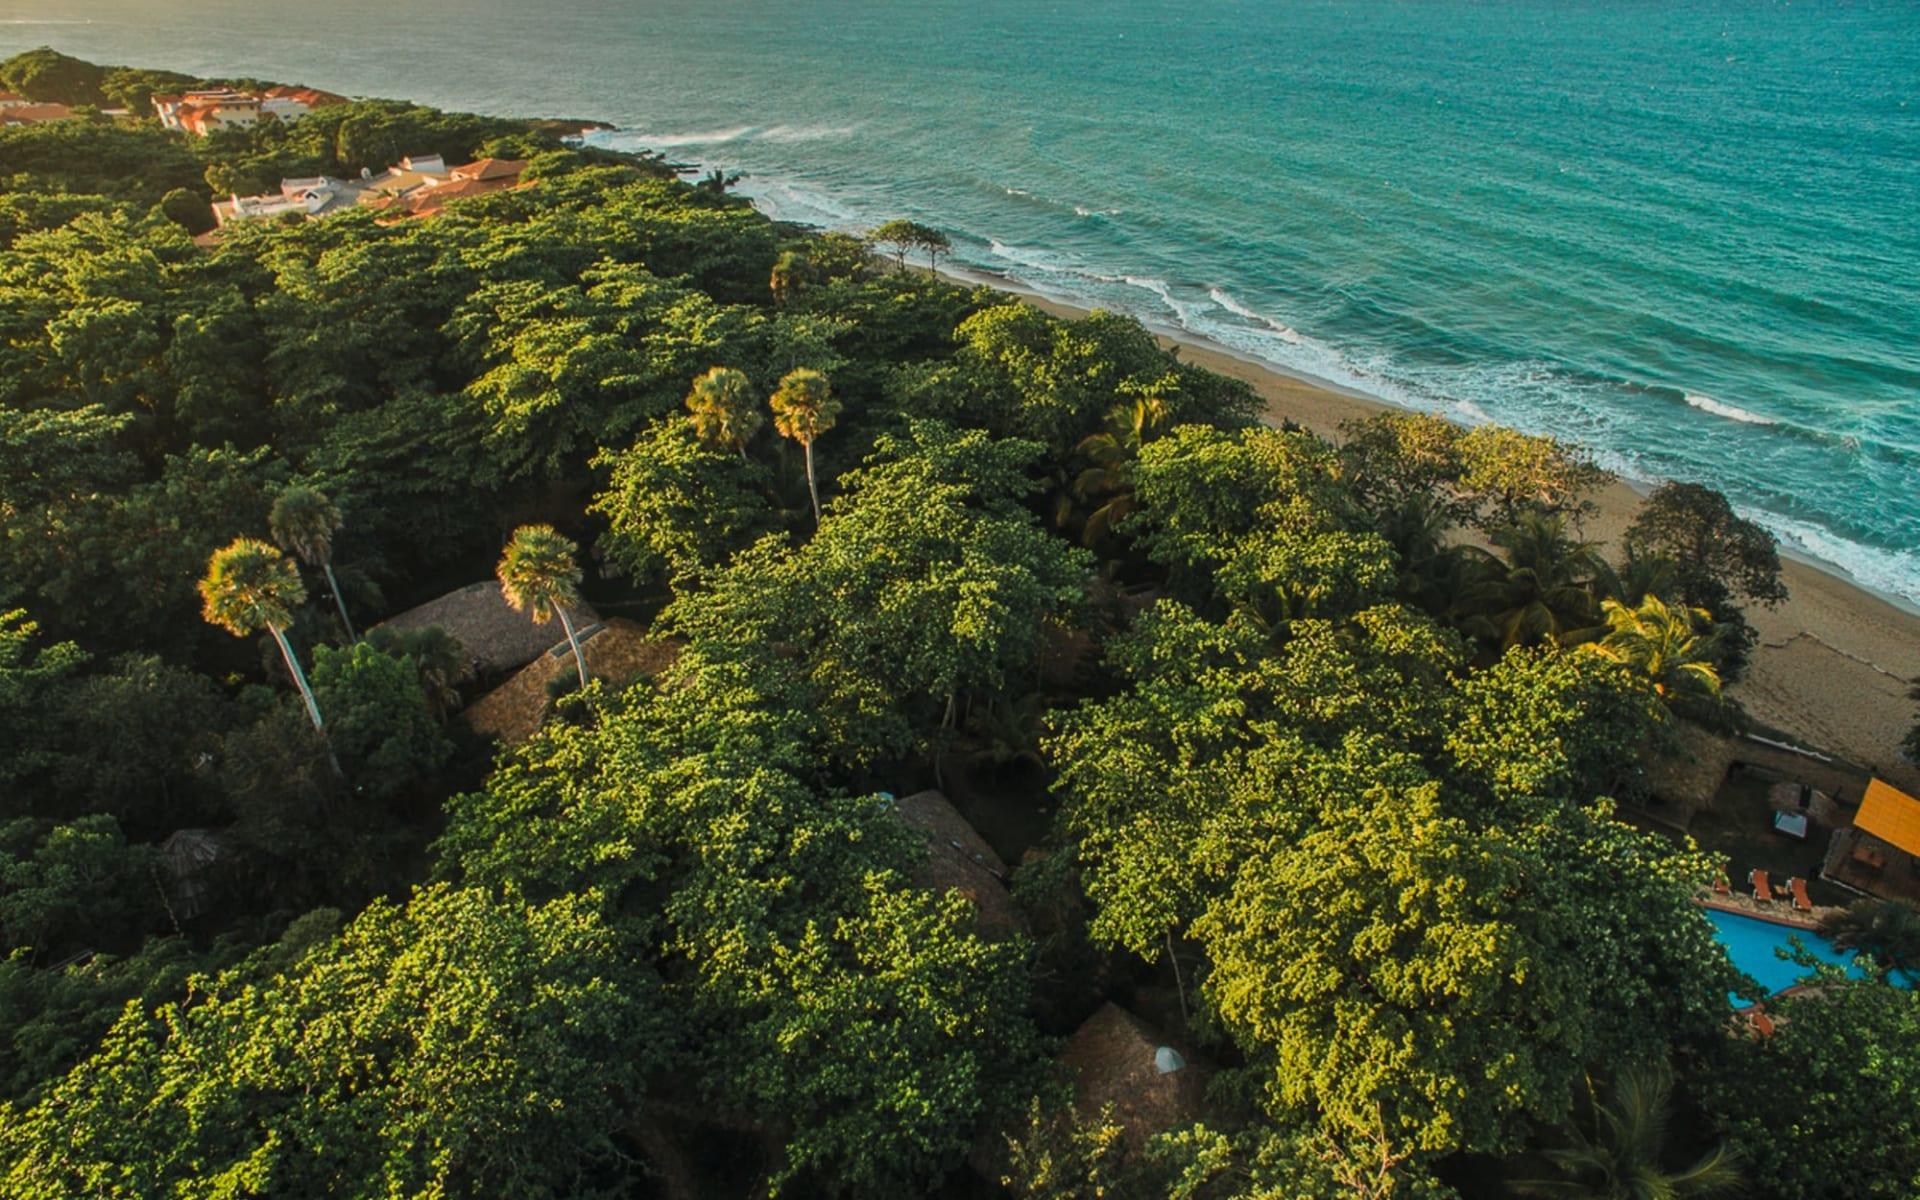 Natura Cabaña in Cabarete: exterior Forest Ocean Natura Cabana - Exterior View cLatinconnect